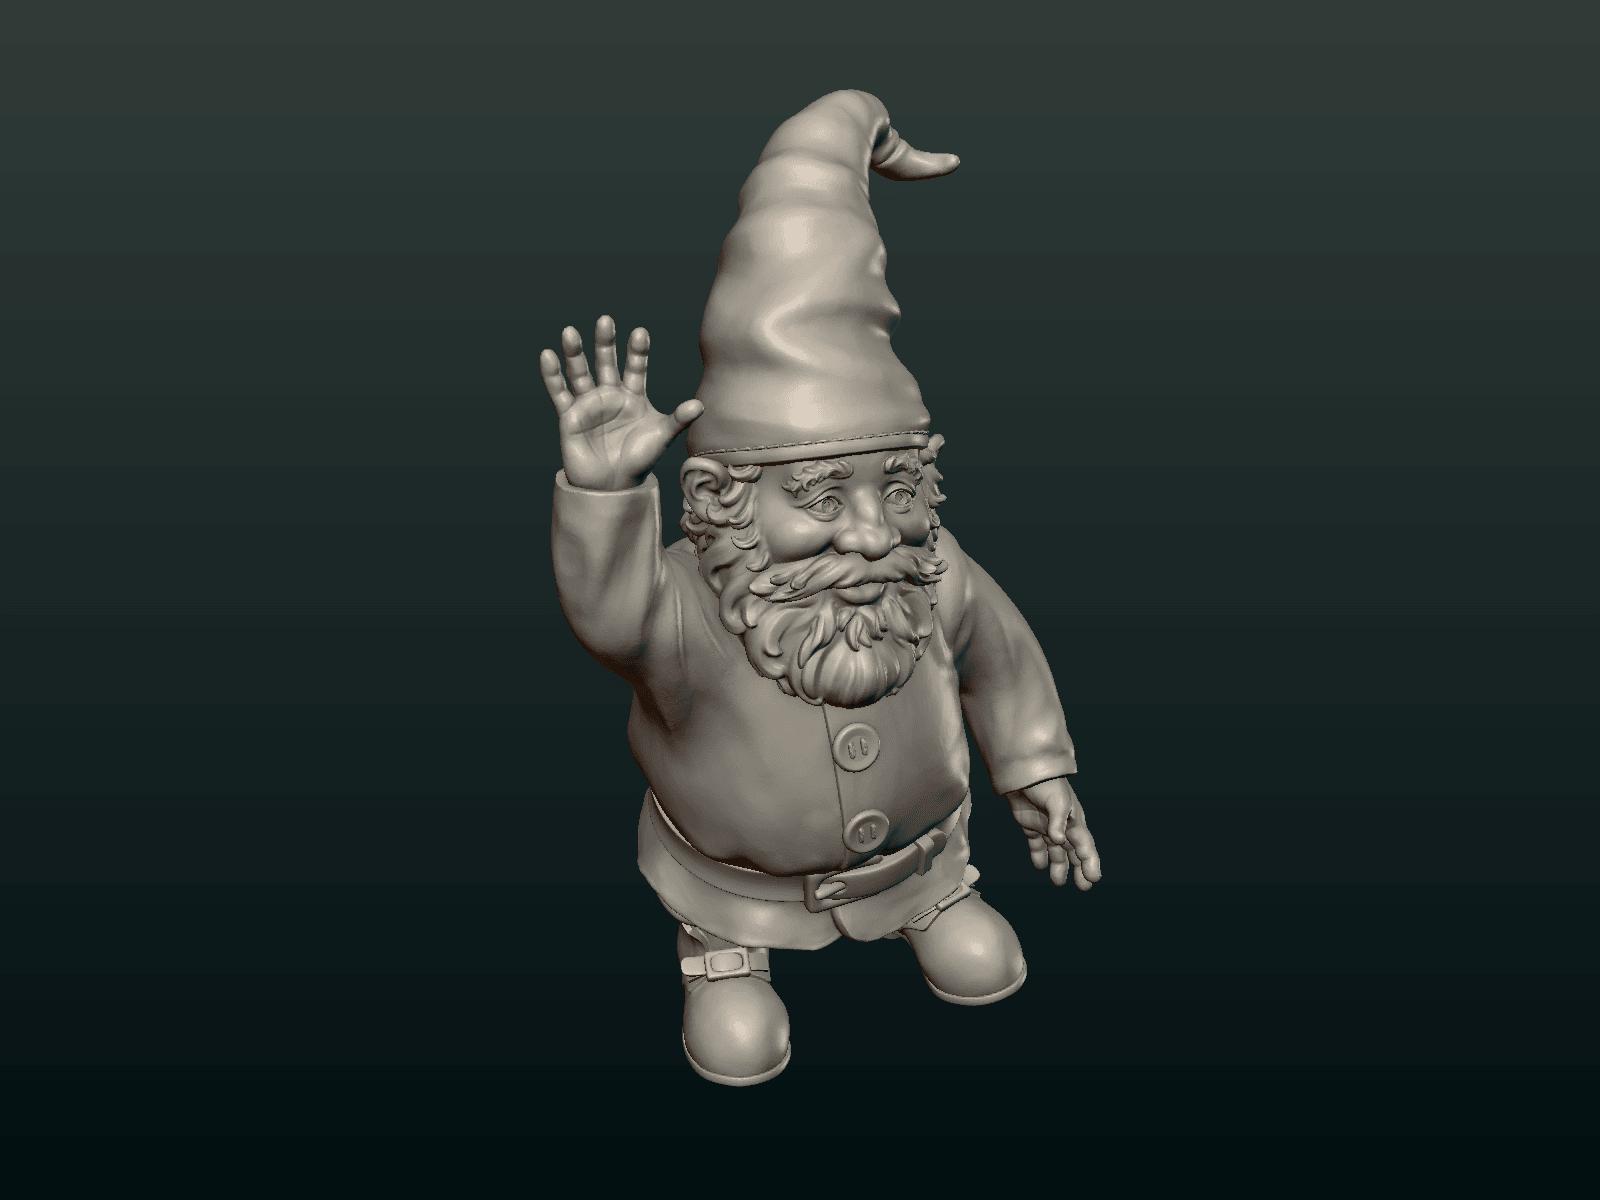 Garden_Gnome-04.png Download STL file Garden Gnome • 3D printing design, Skazok